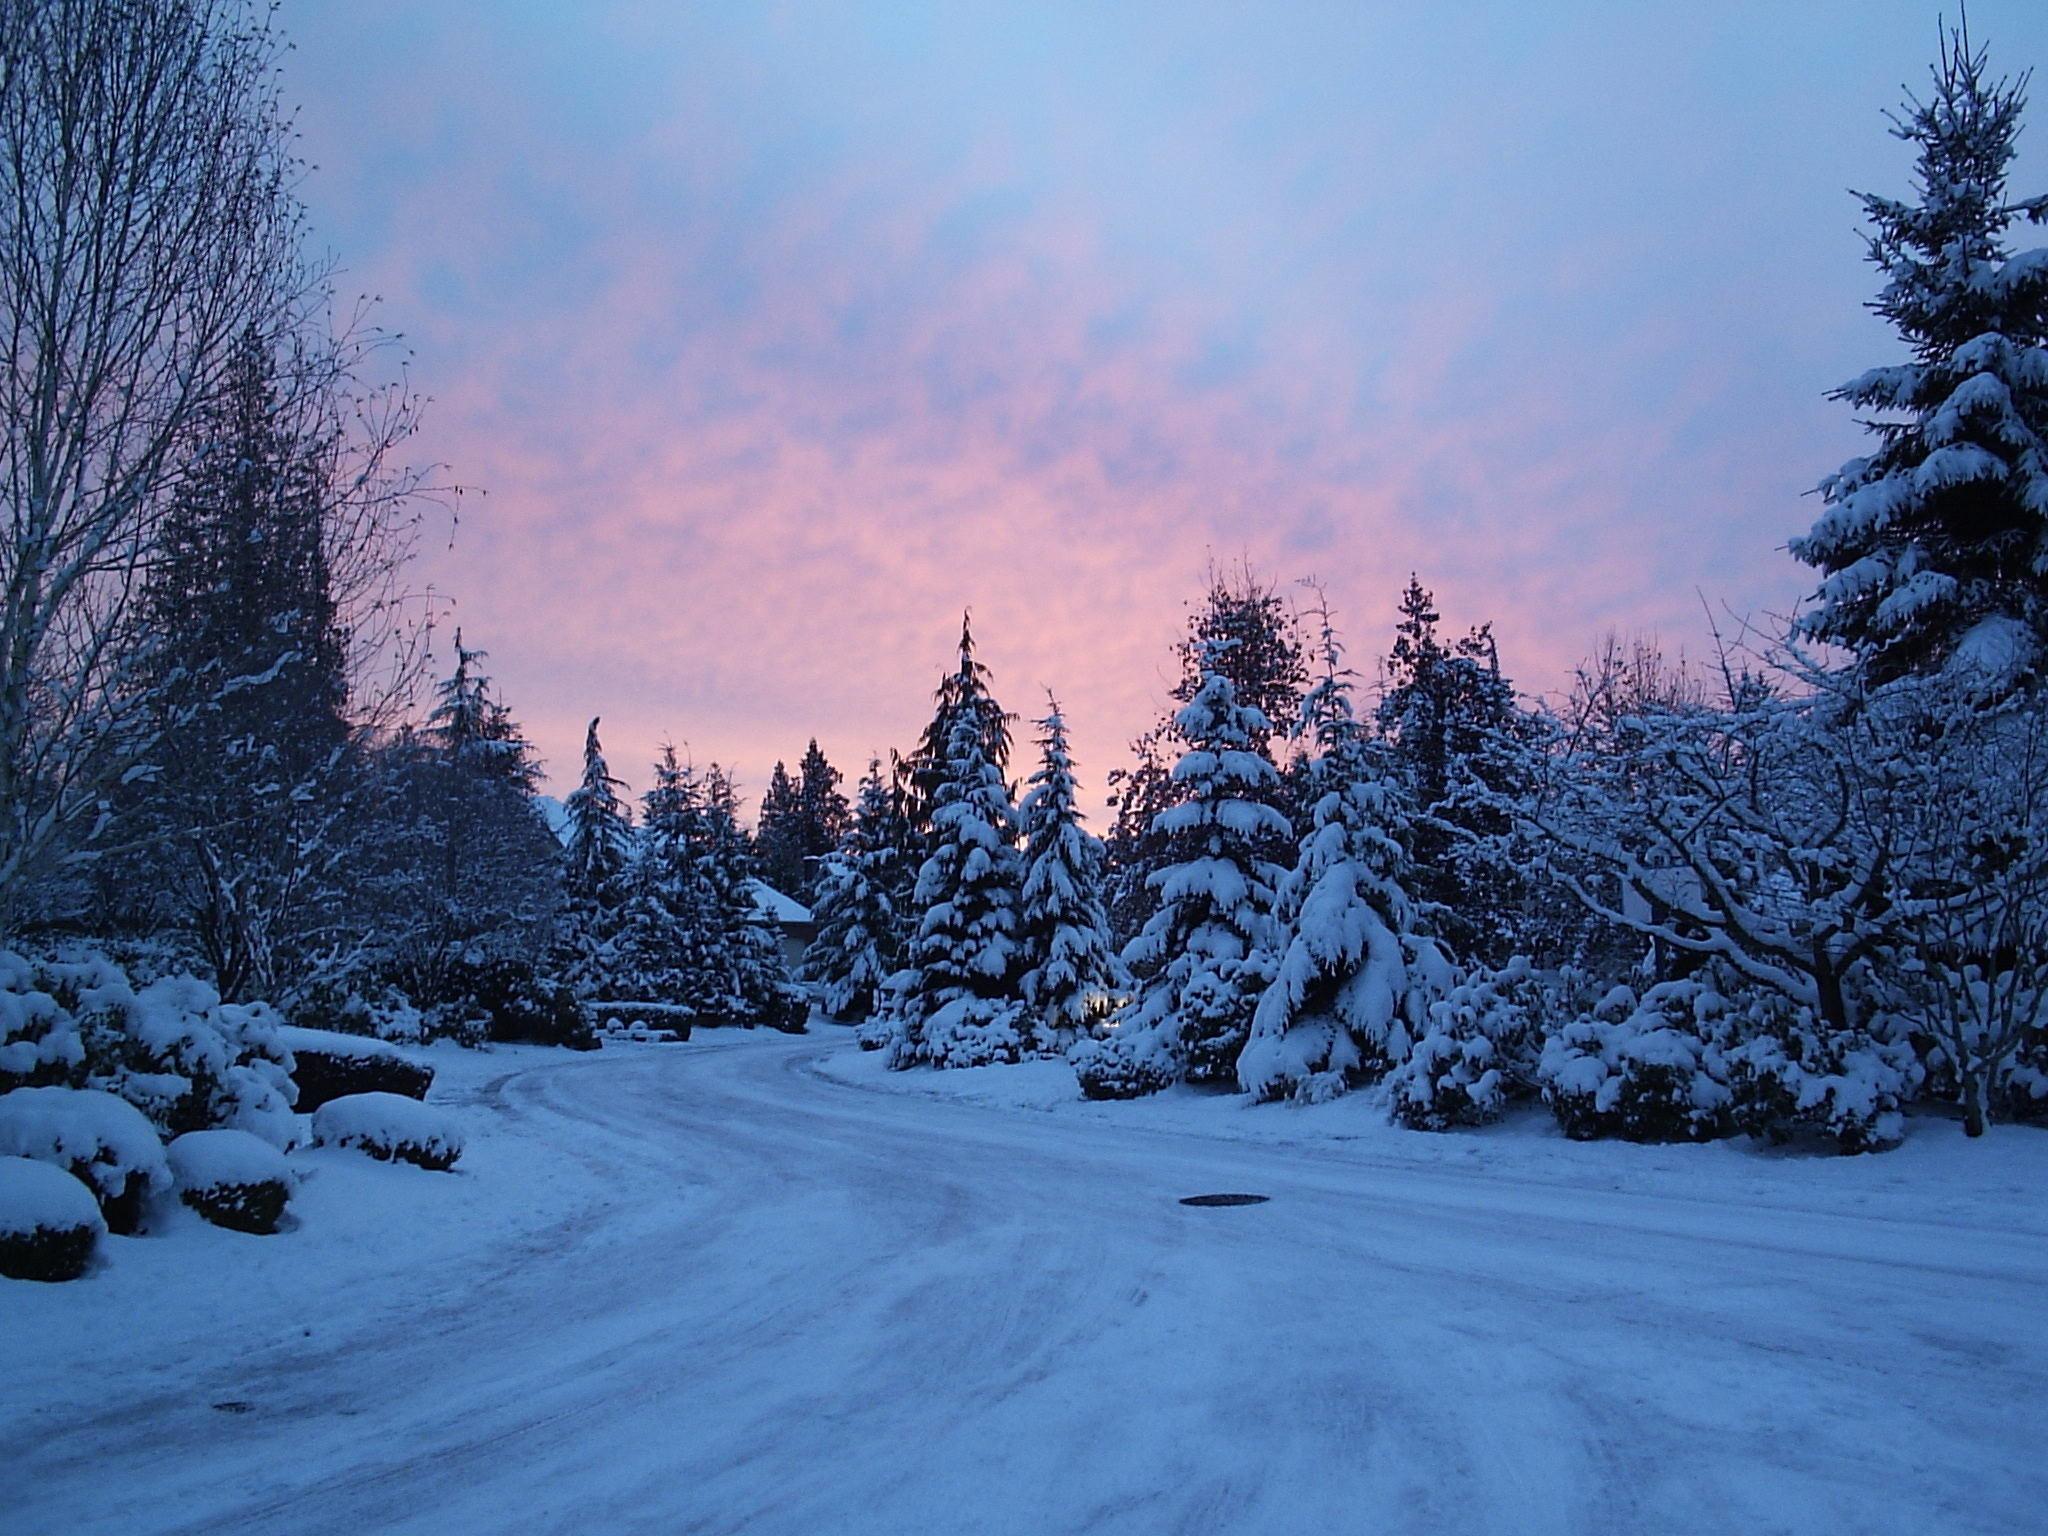 Sfondi neve 50 immagini for Sfondi invernali hd